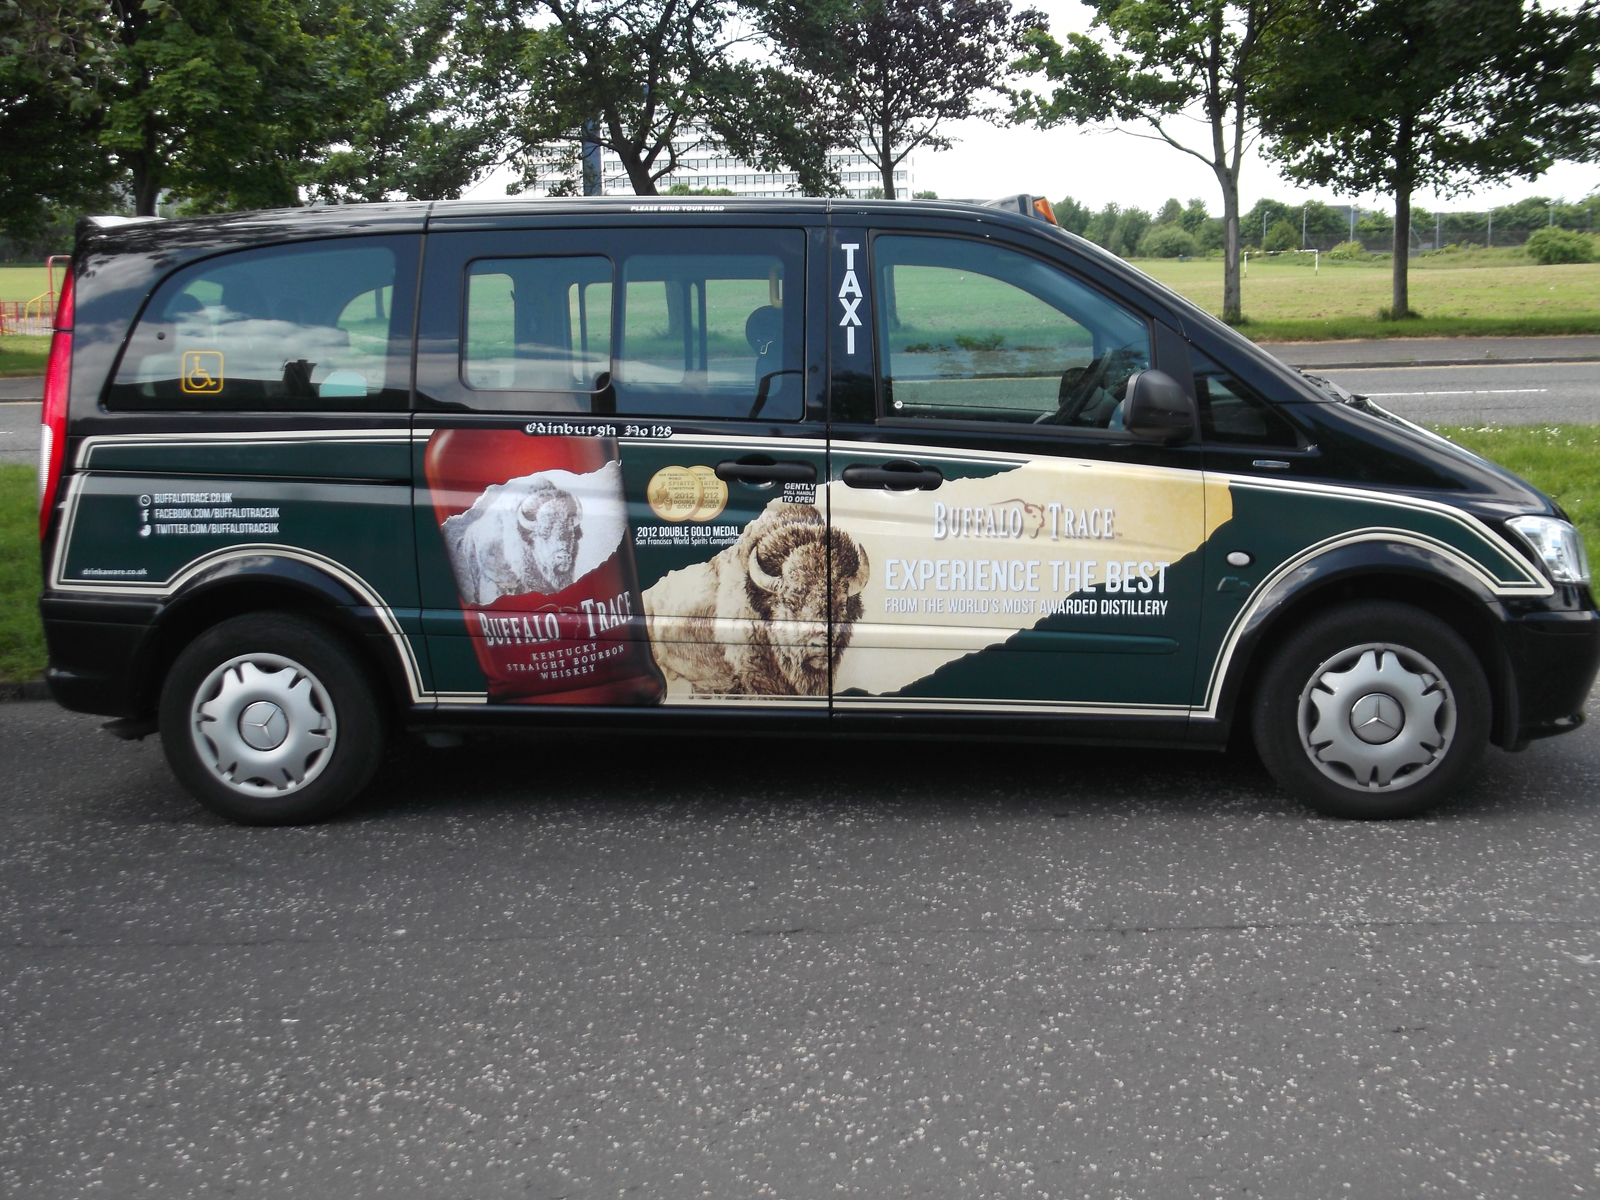 2013 Ubiquitous taxi advertising campaign for Hi Spirits - Hi Spirits